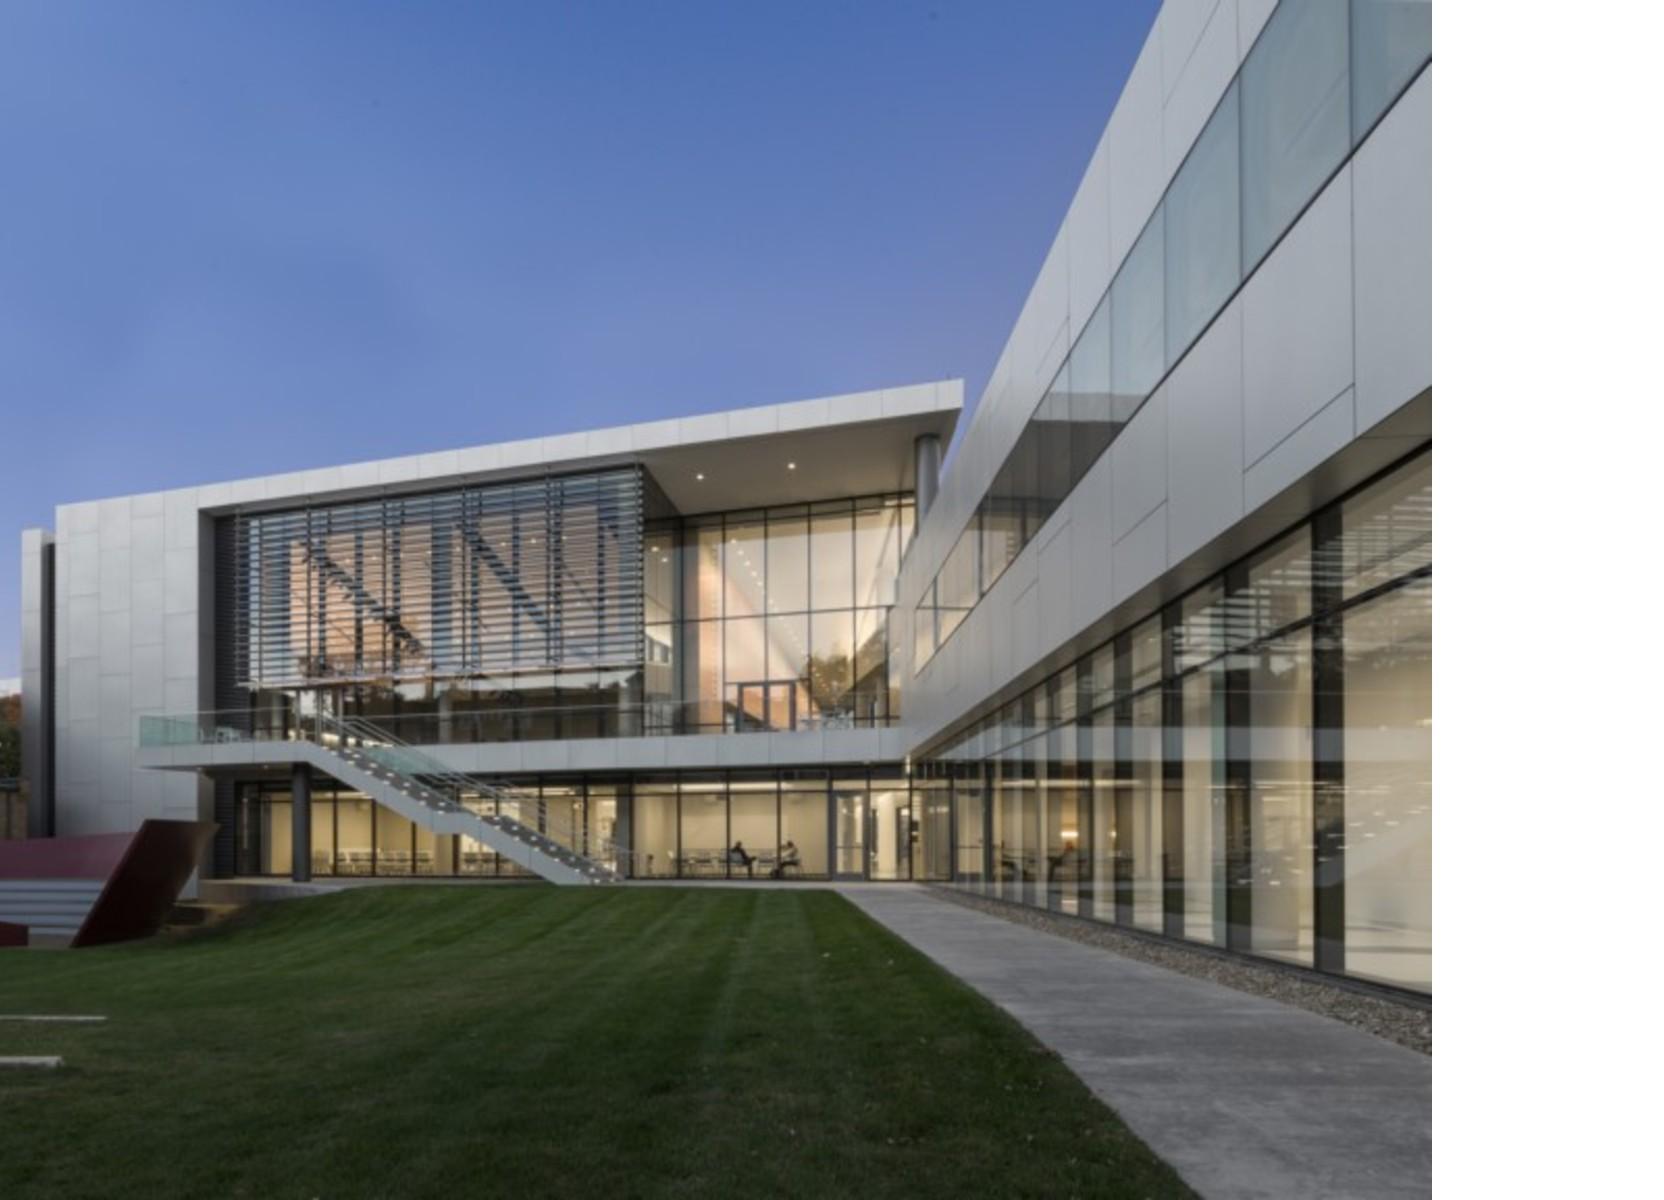 Perkins+Will Centro Universitario Tinkham Veale CWRU Ohio